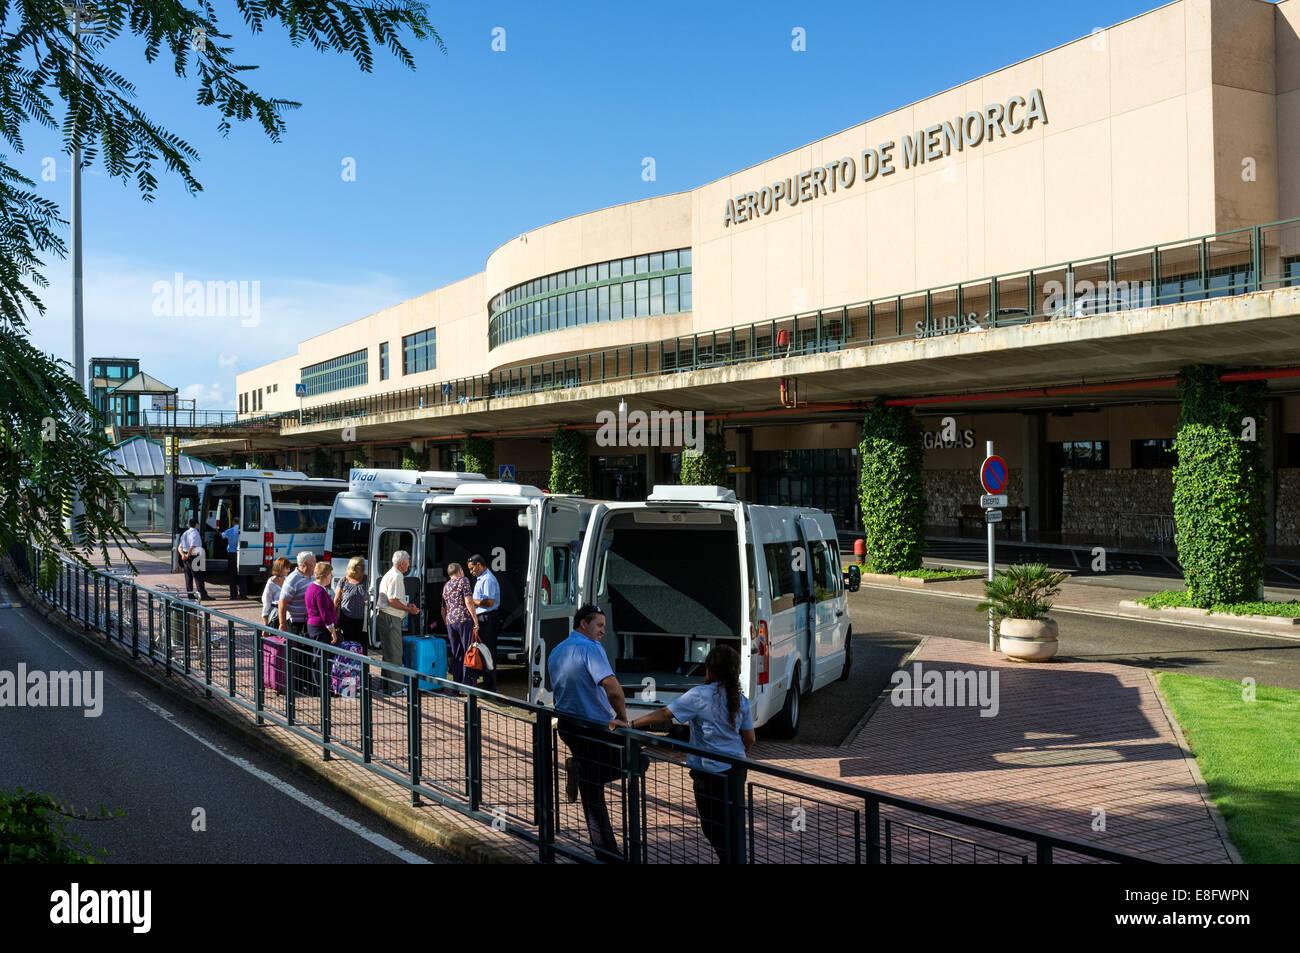 mahon airport menorca spanien stockfoto bild 74108237. Black Bedroom Furniture Sets. Home Design Ideas